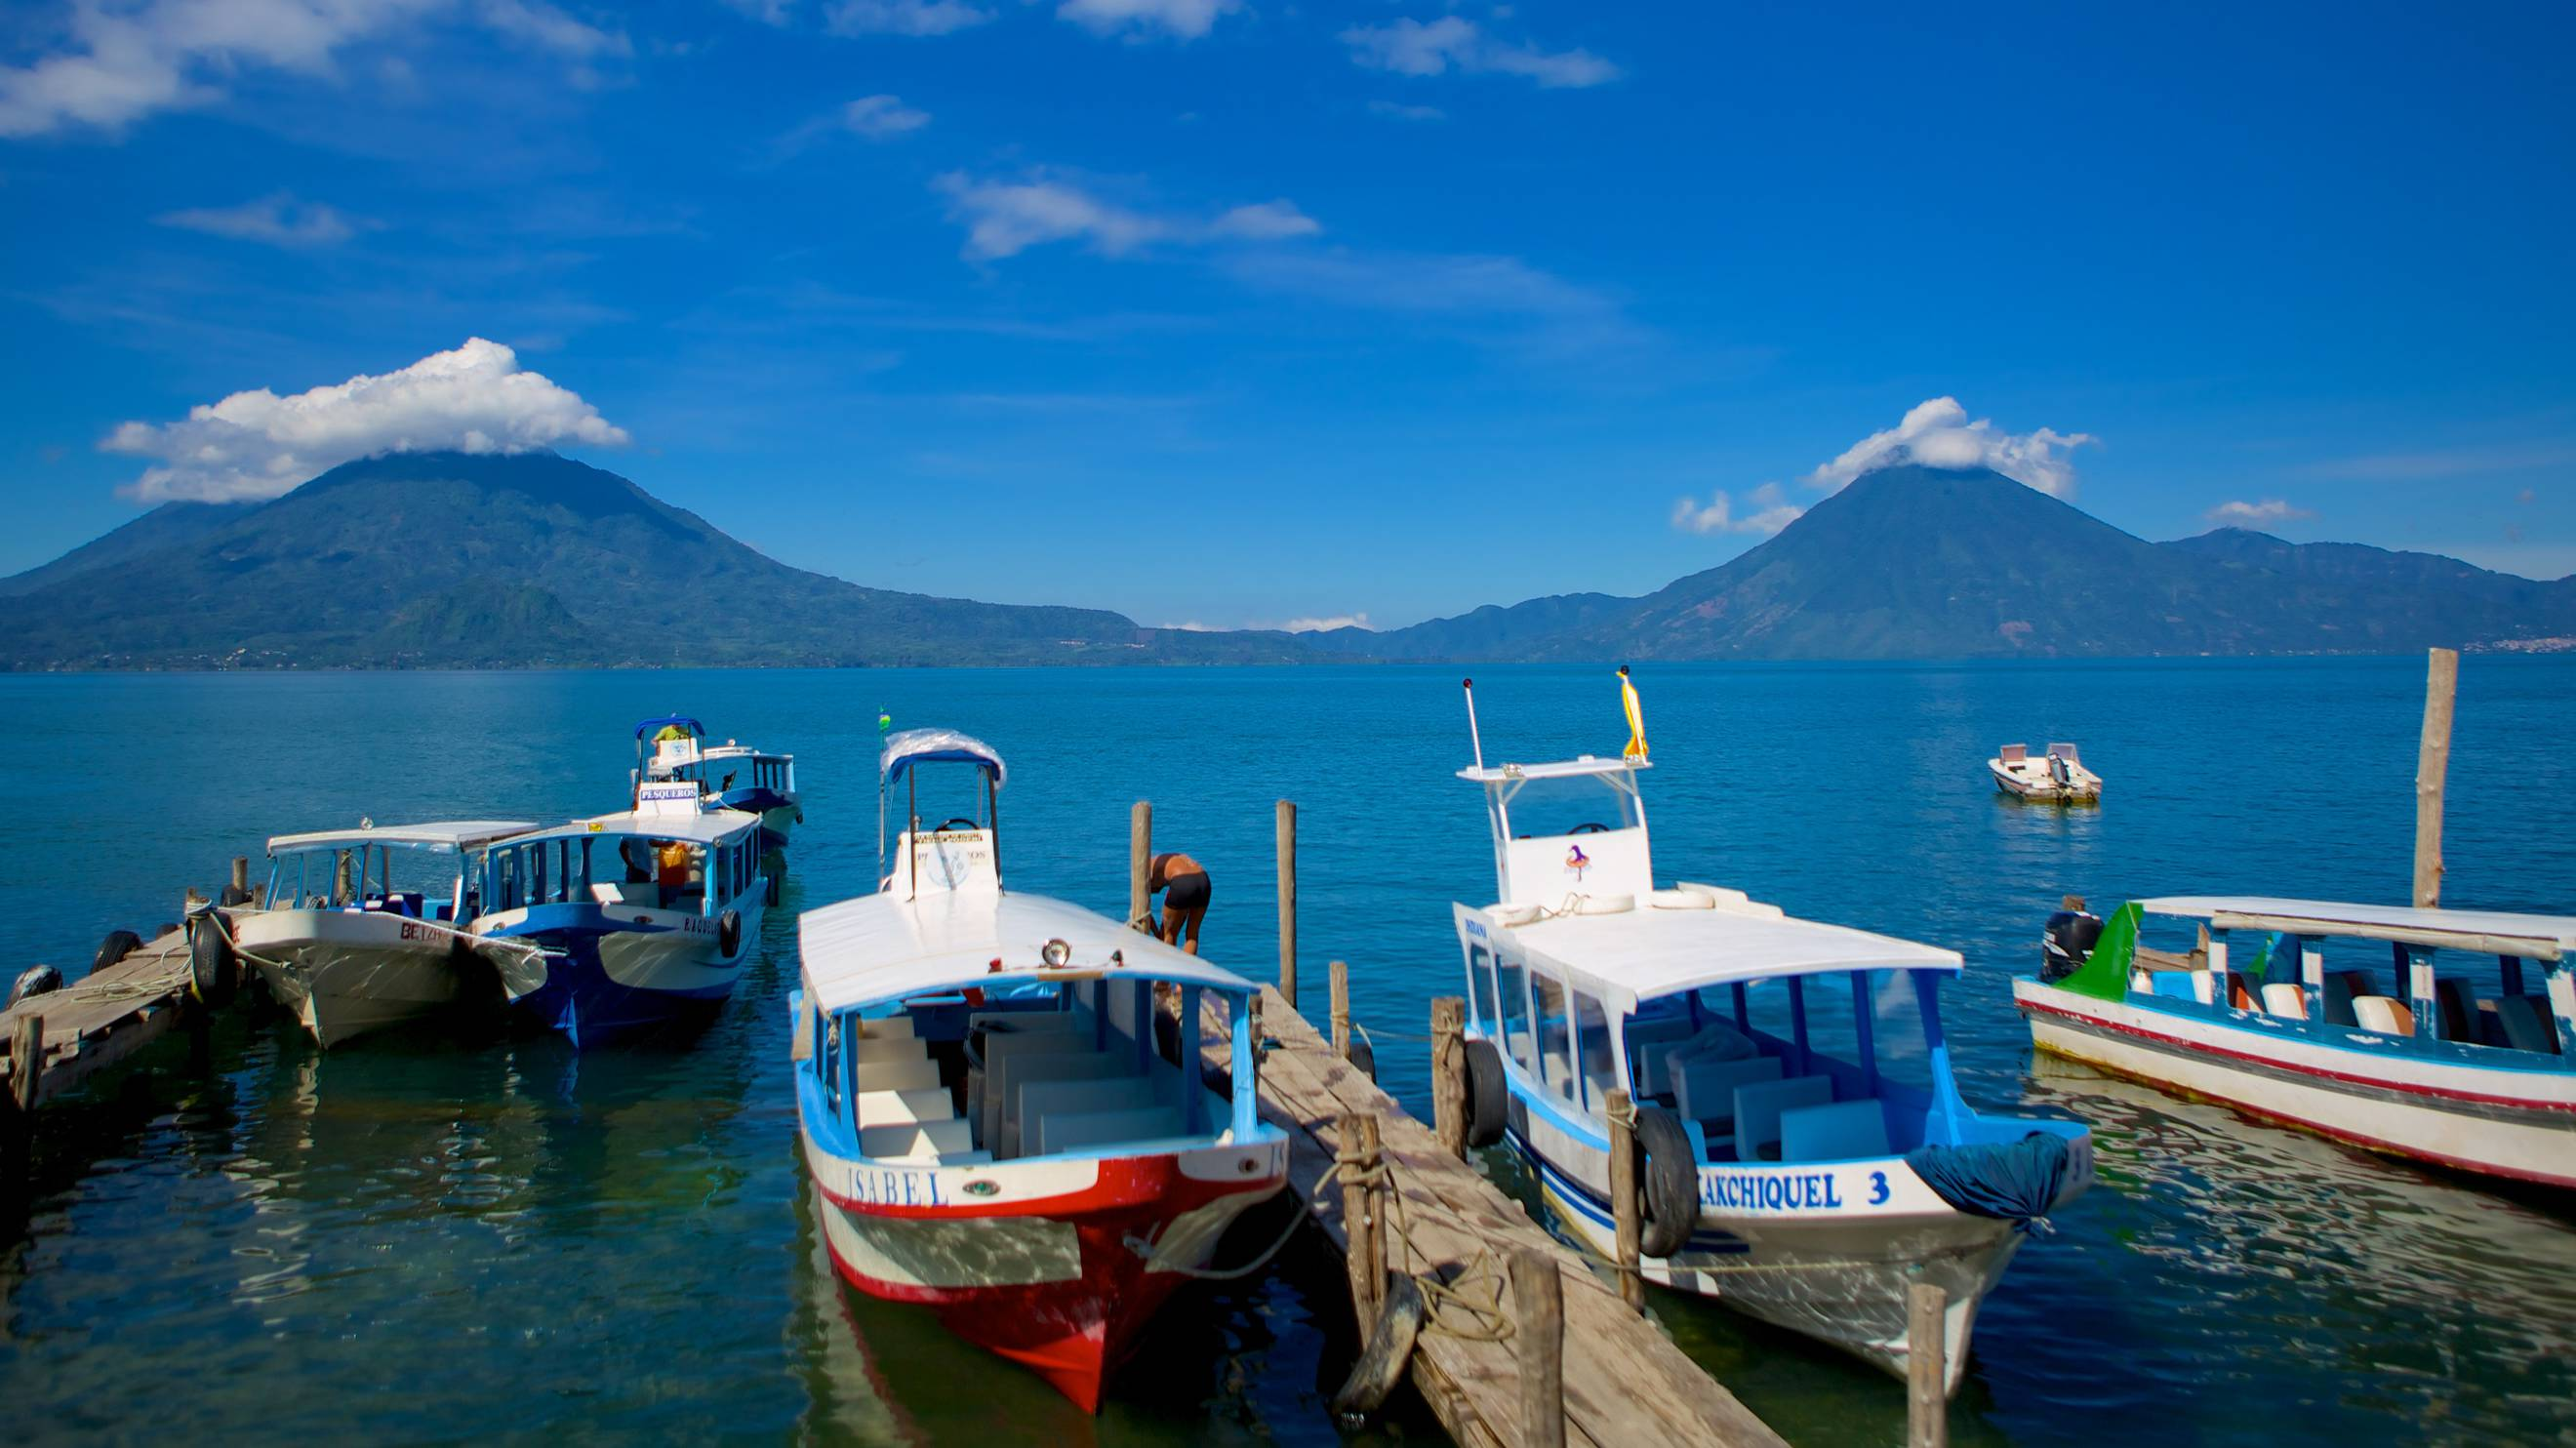 The 10 Best Hotels In Panajachel Solola 28 For 2019 Expedia